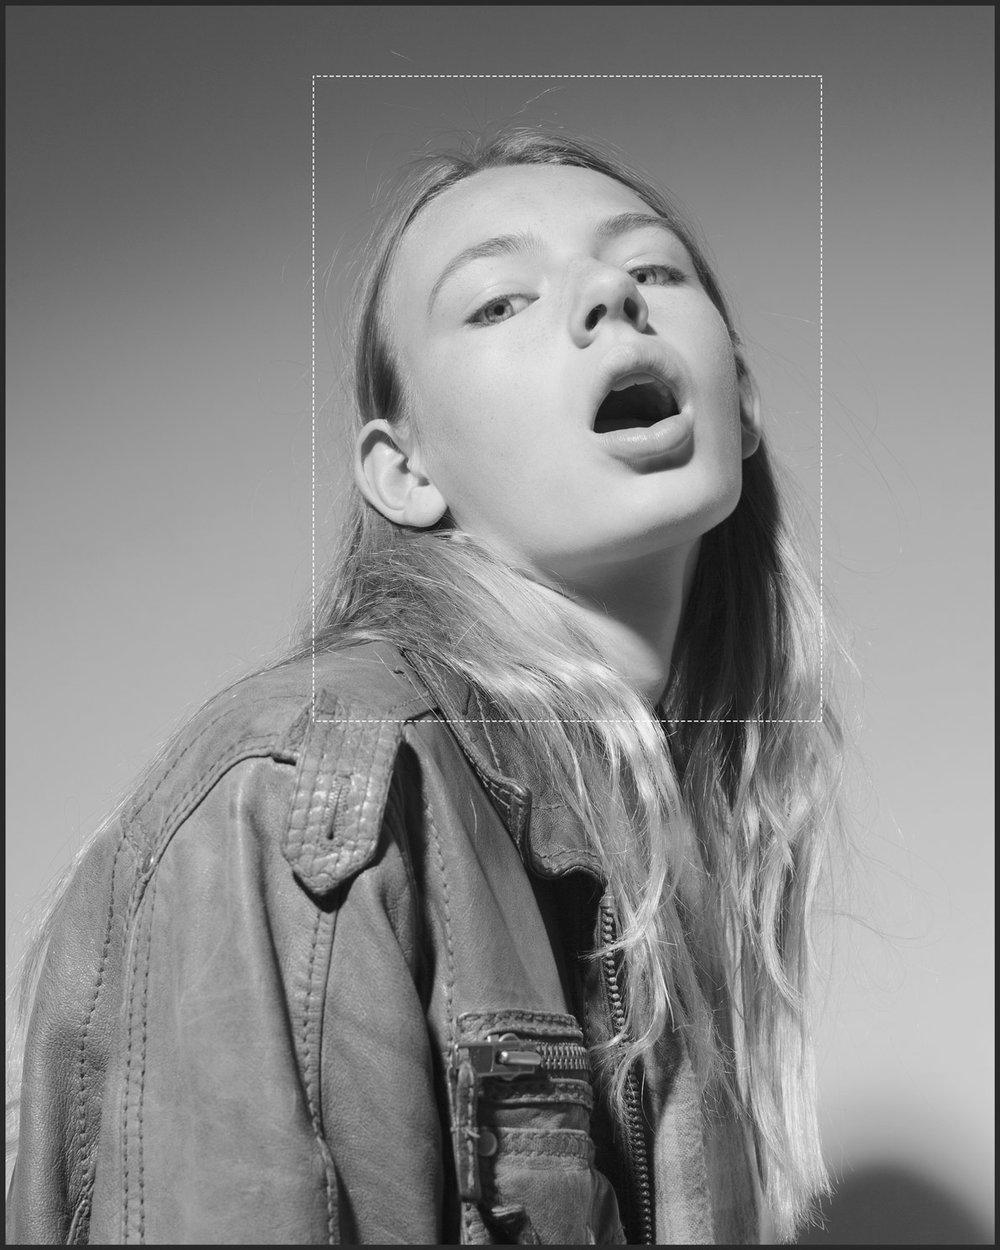 Nick_Sabatalo_Fashion_Photography_Inspirational_Artist_Newsletter_Motivational_Quote_Peronal_Development_Exercise_Bronte_Schleppi_Photogenics_LA_Models-28.jpg